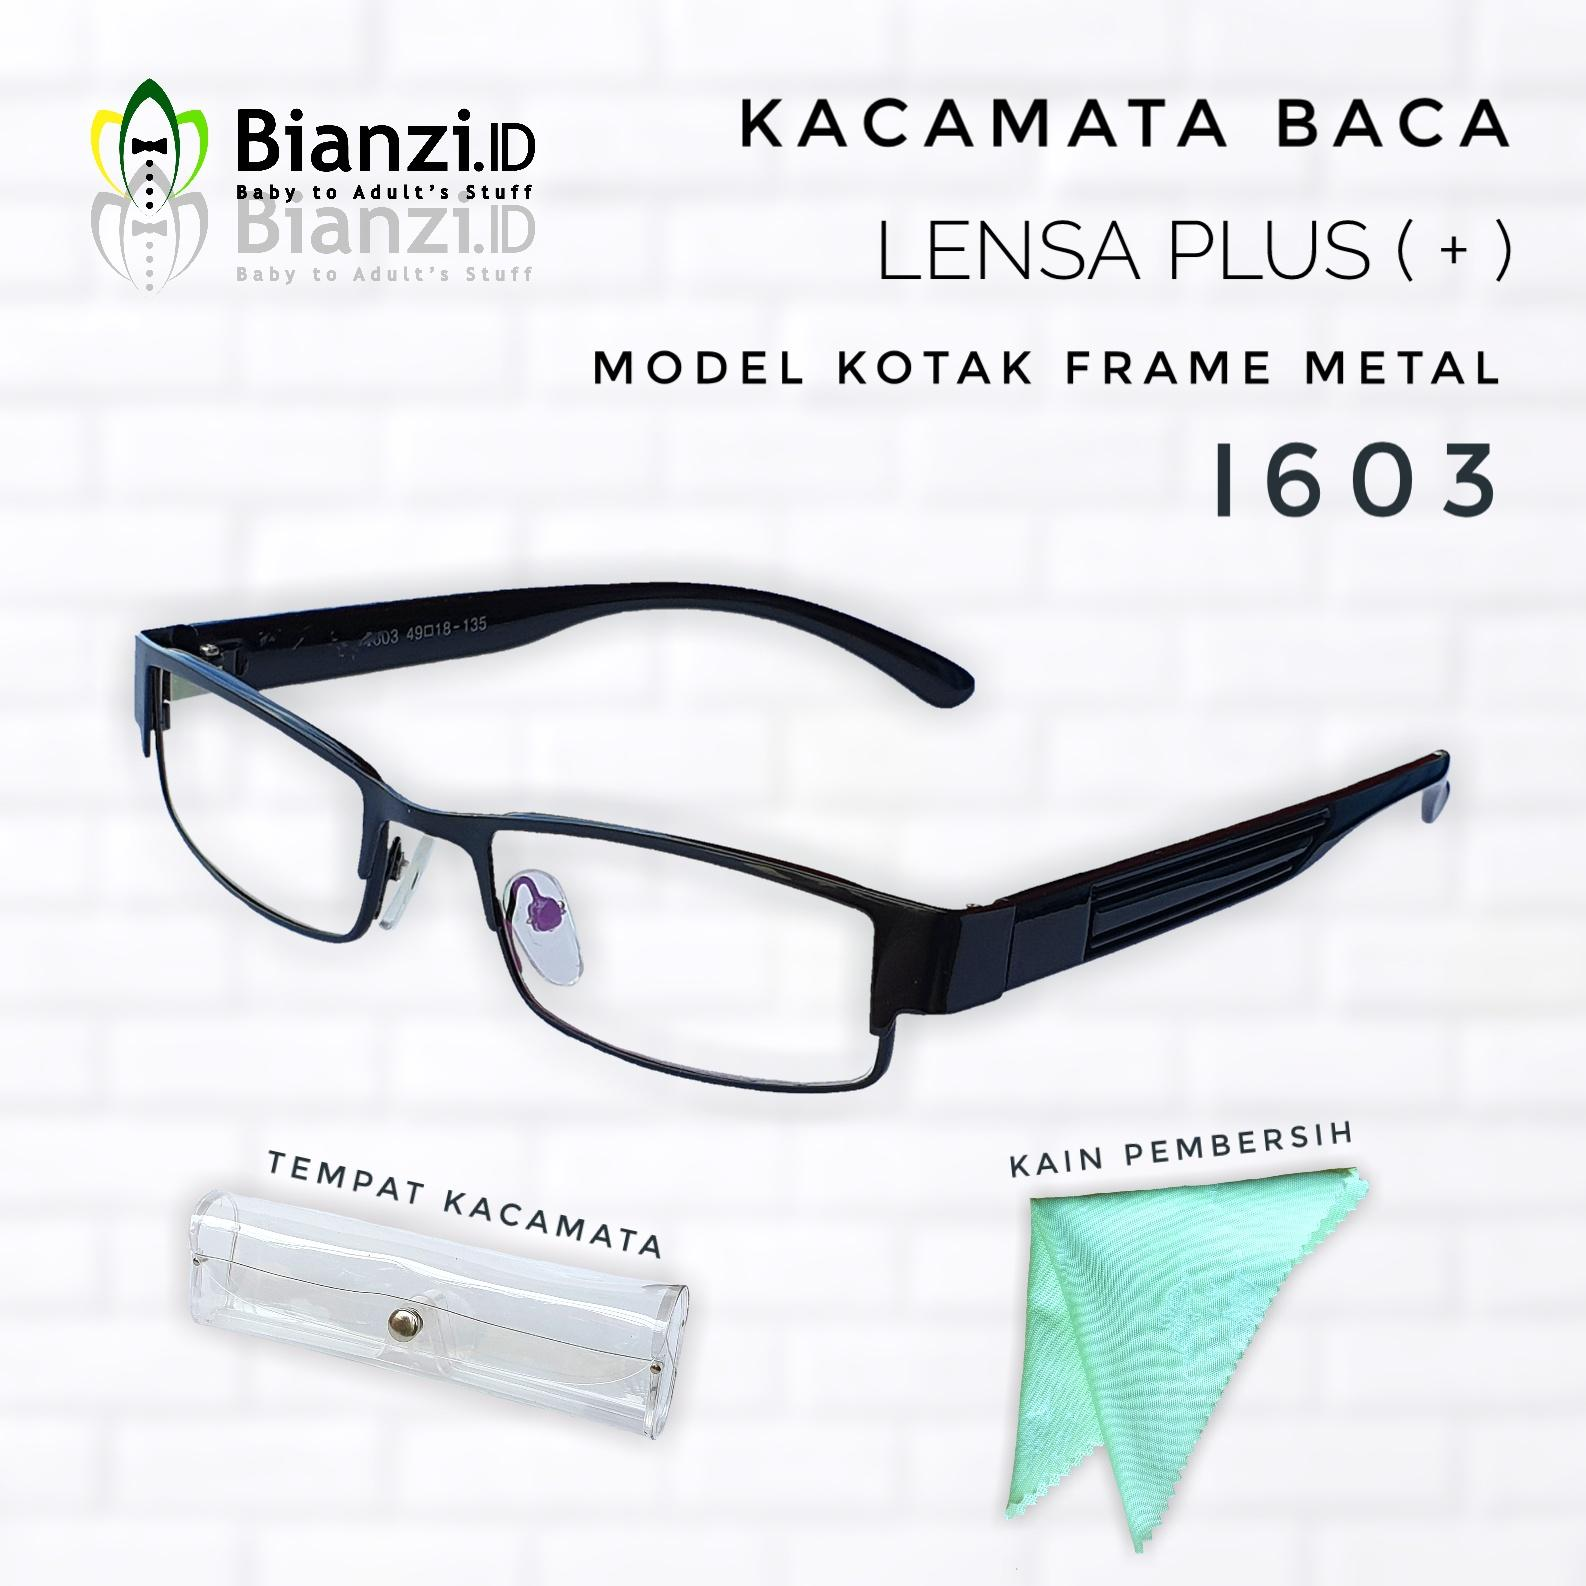 Jual kacamata baca kacamata murah garansi dan berkualitas  71bead5709